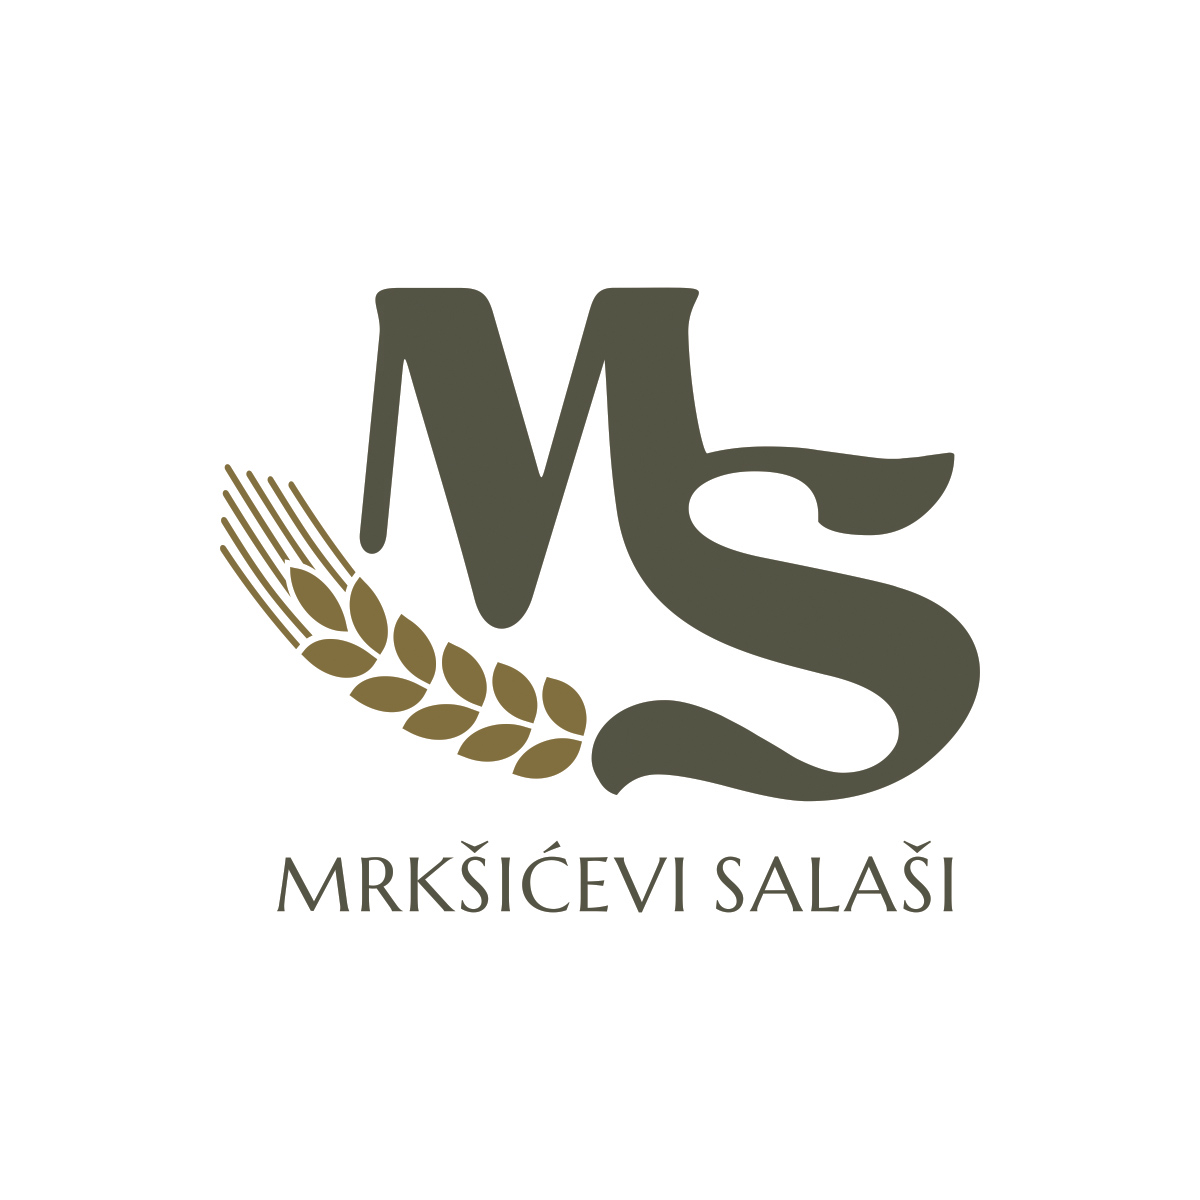 Mrkšićevi salaši doo logo